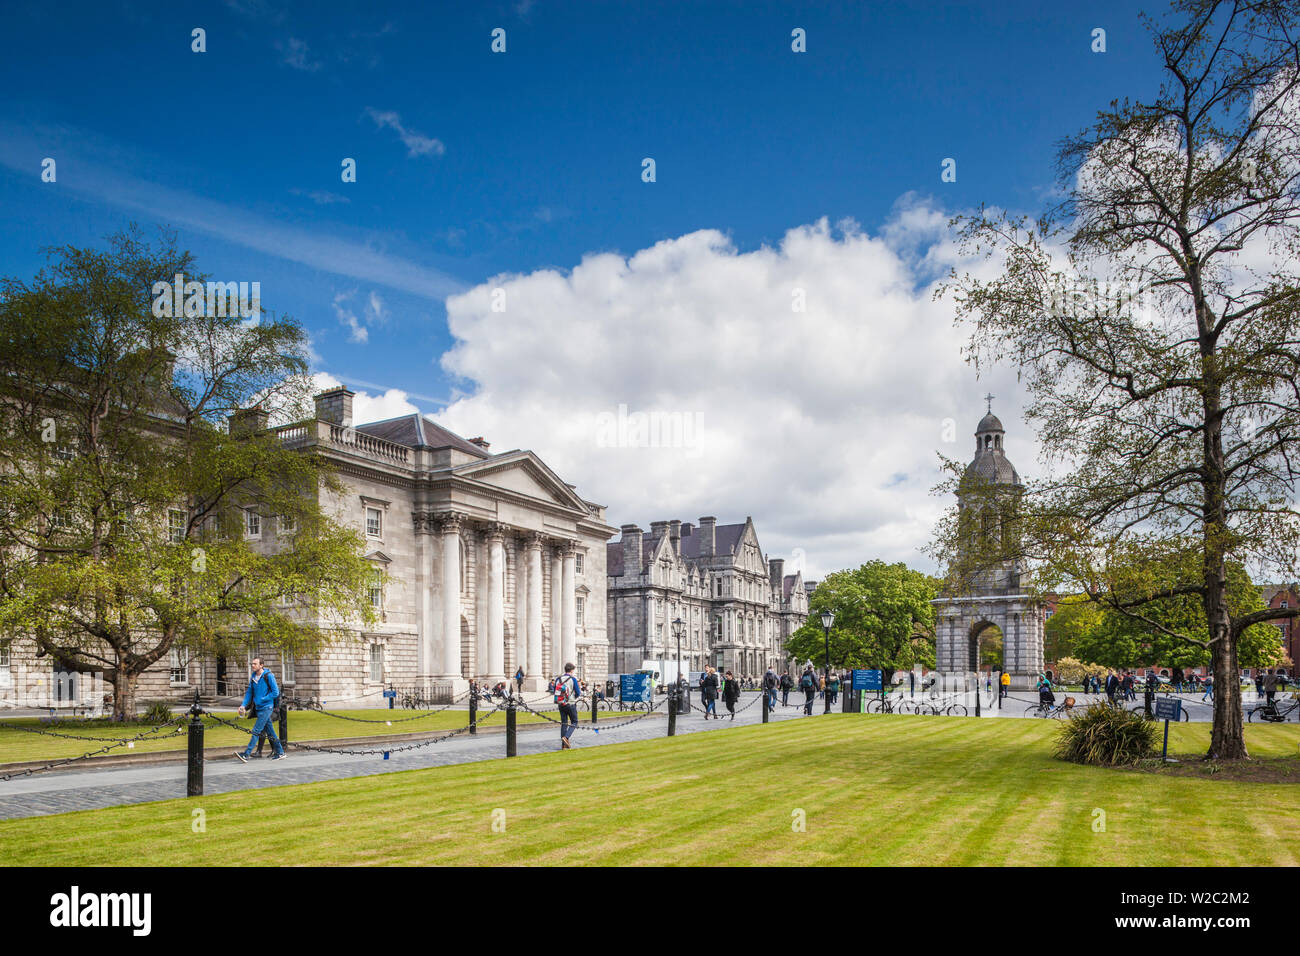 Ireland, Dublin, Trinity College, Parliament Square and Campanile Stock Photo